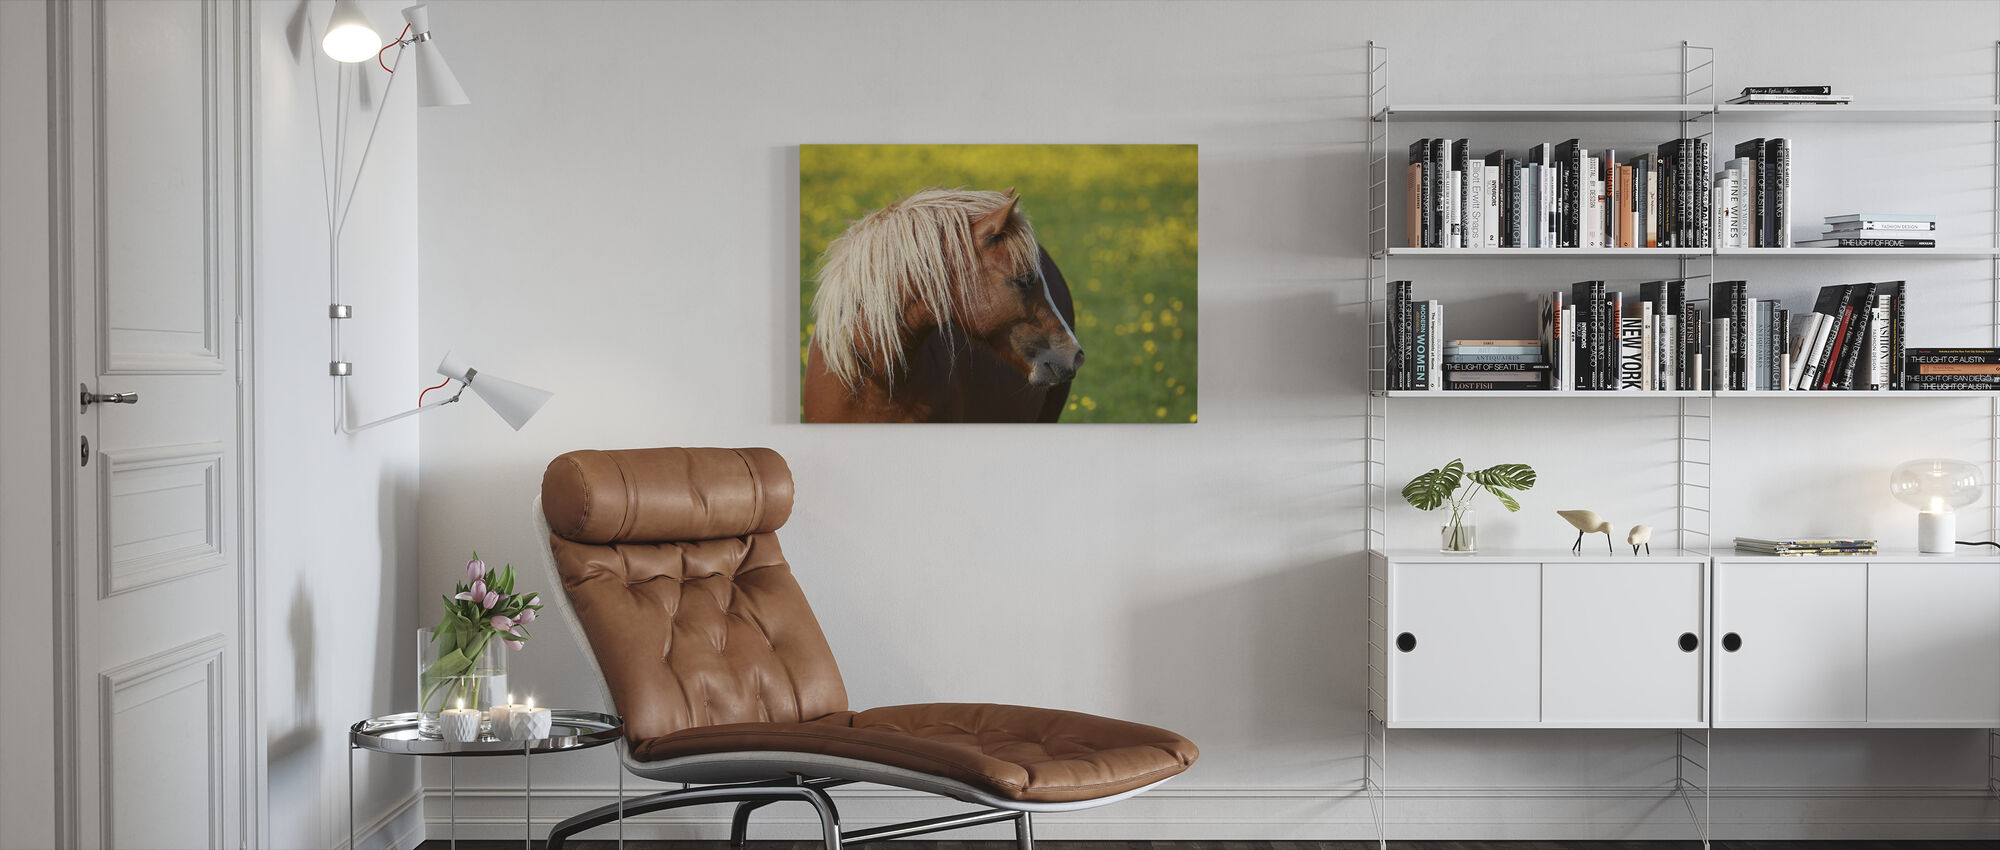 Hevosen profiili - Canvastaulu - Olohuone